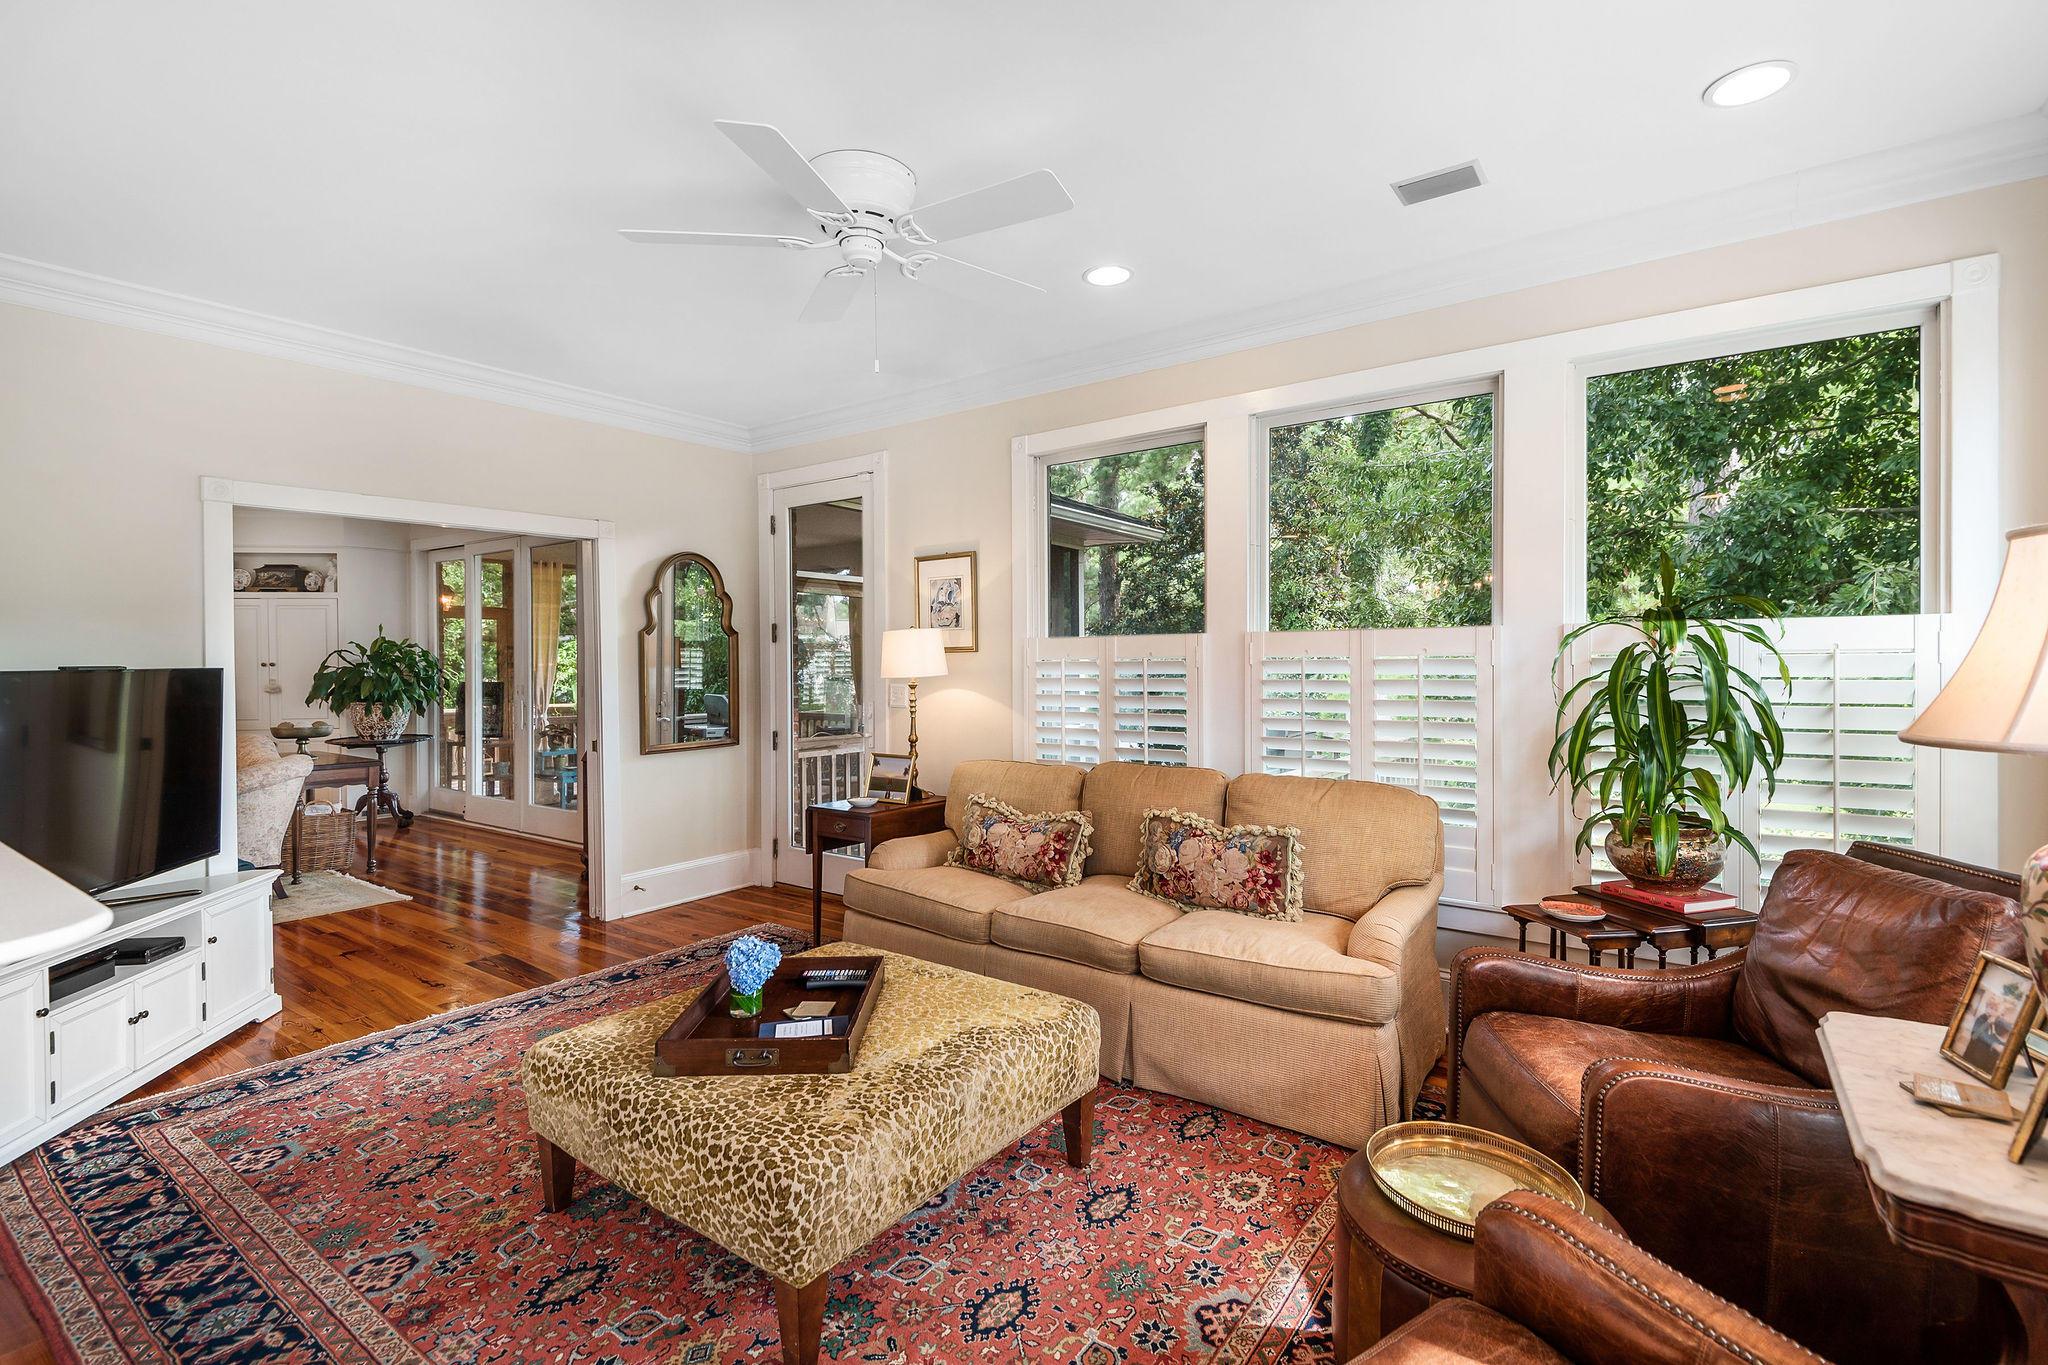 Country Club II Homes For Sale - 1482 Burningtree, Charleston, SC - 43